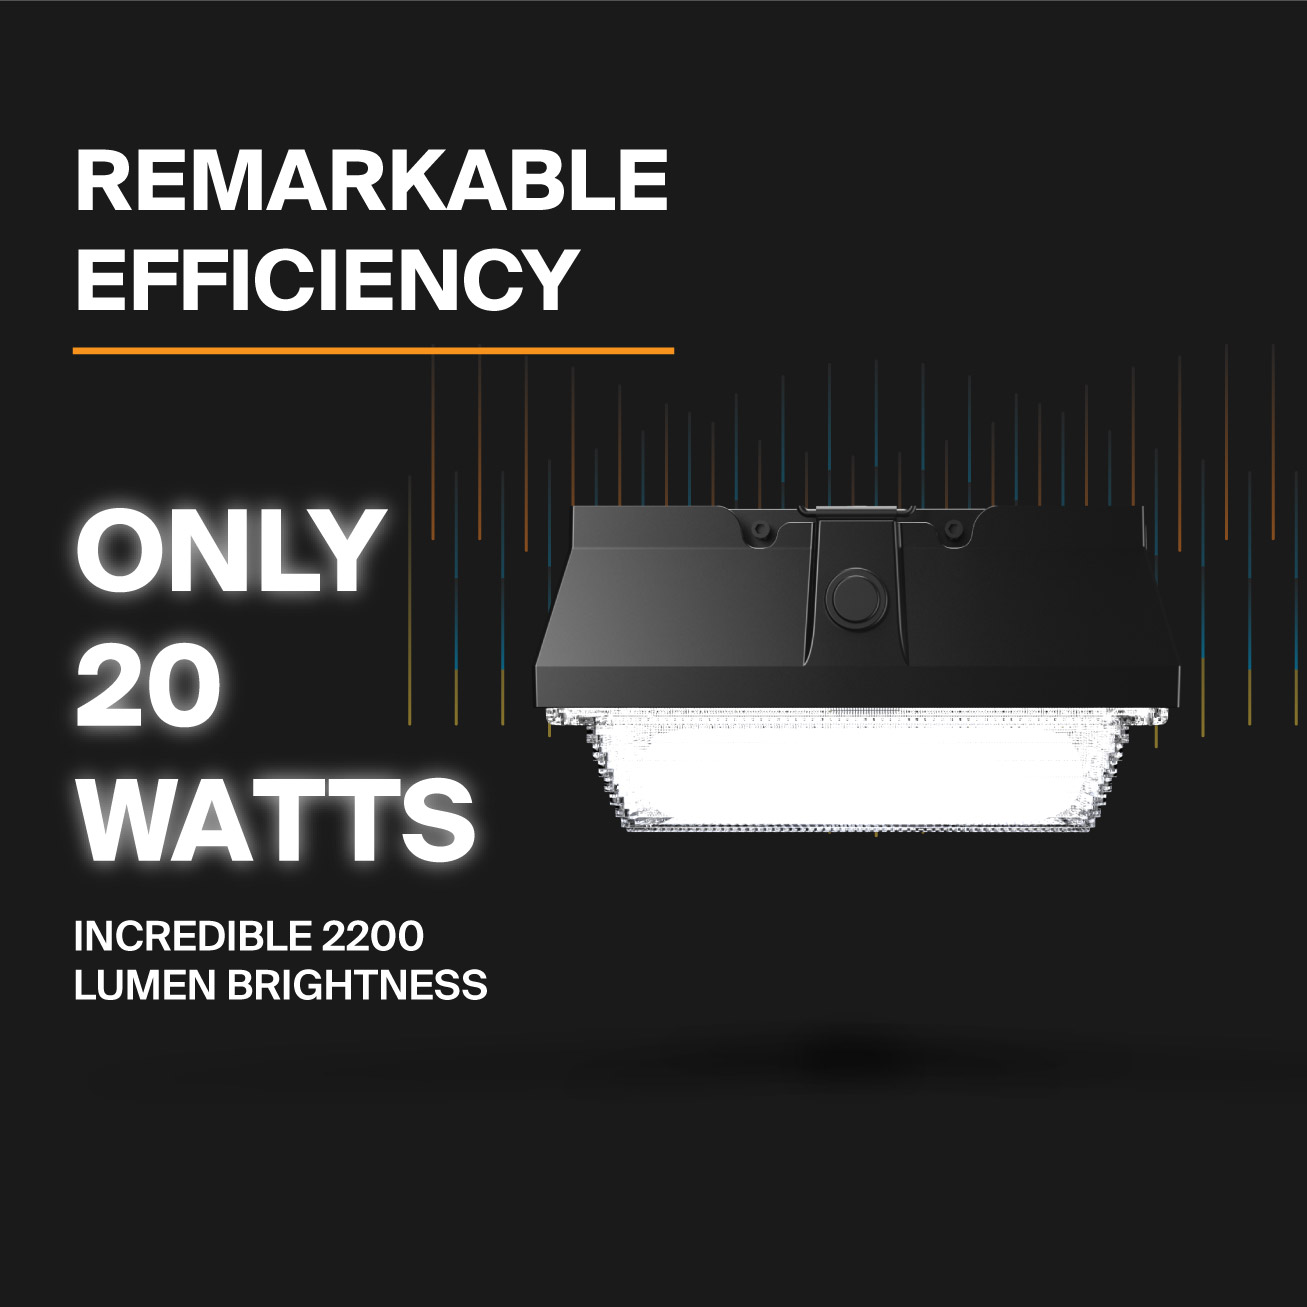 Probrite Helios20 LED Ceiling Light Efficiency